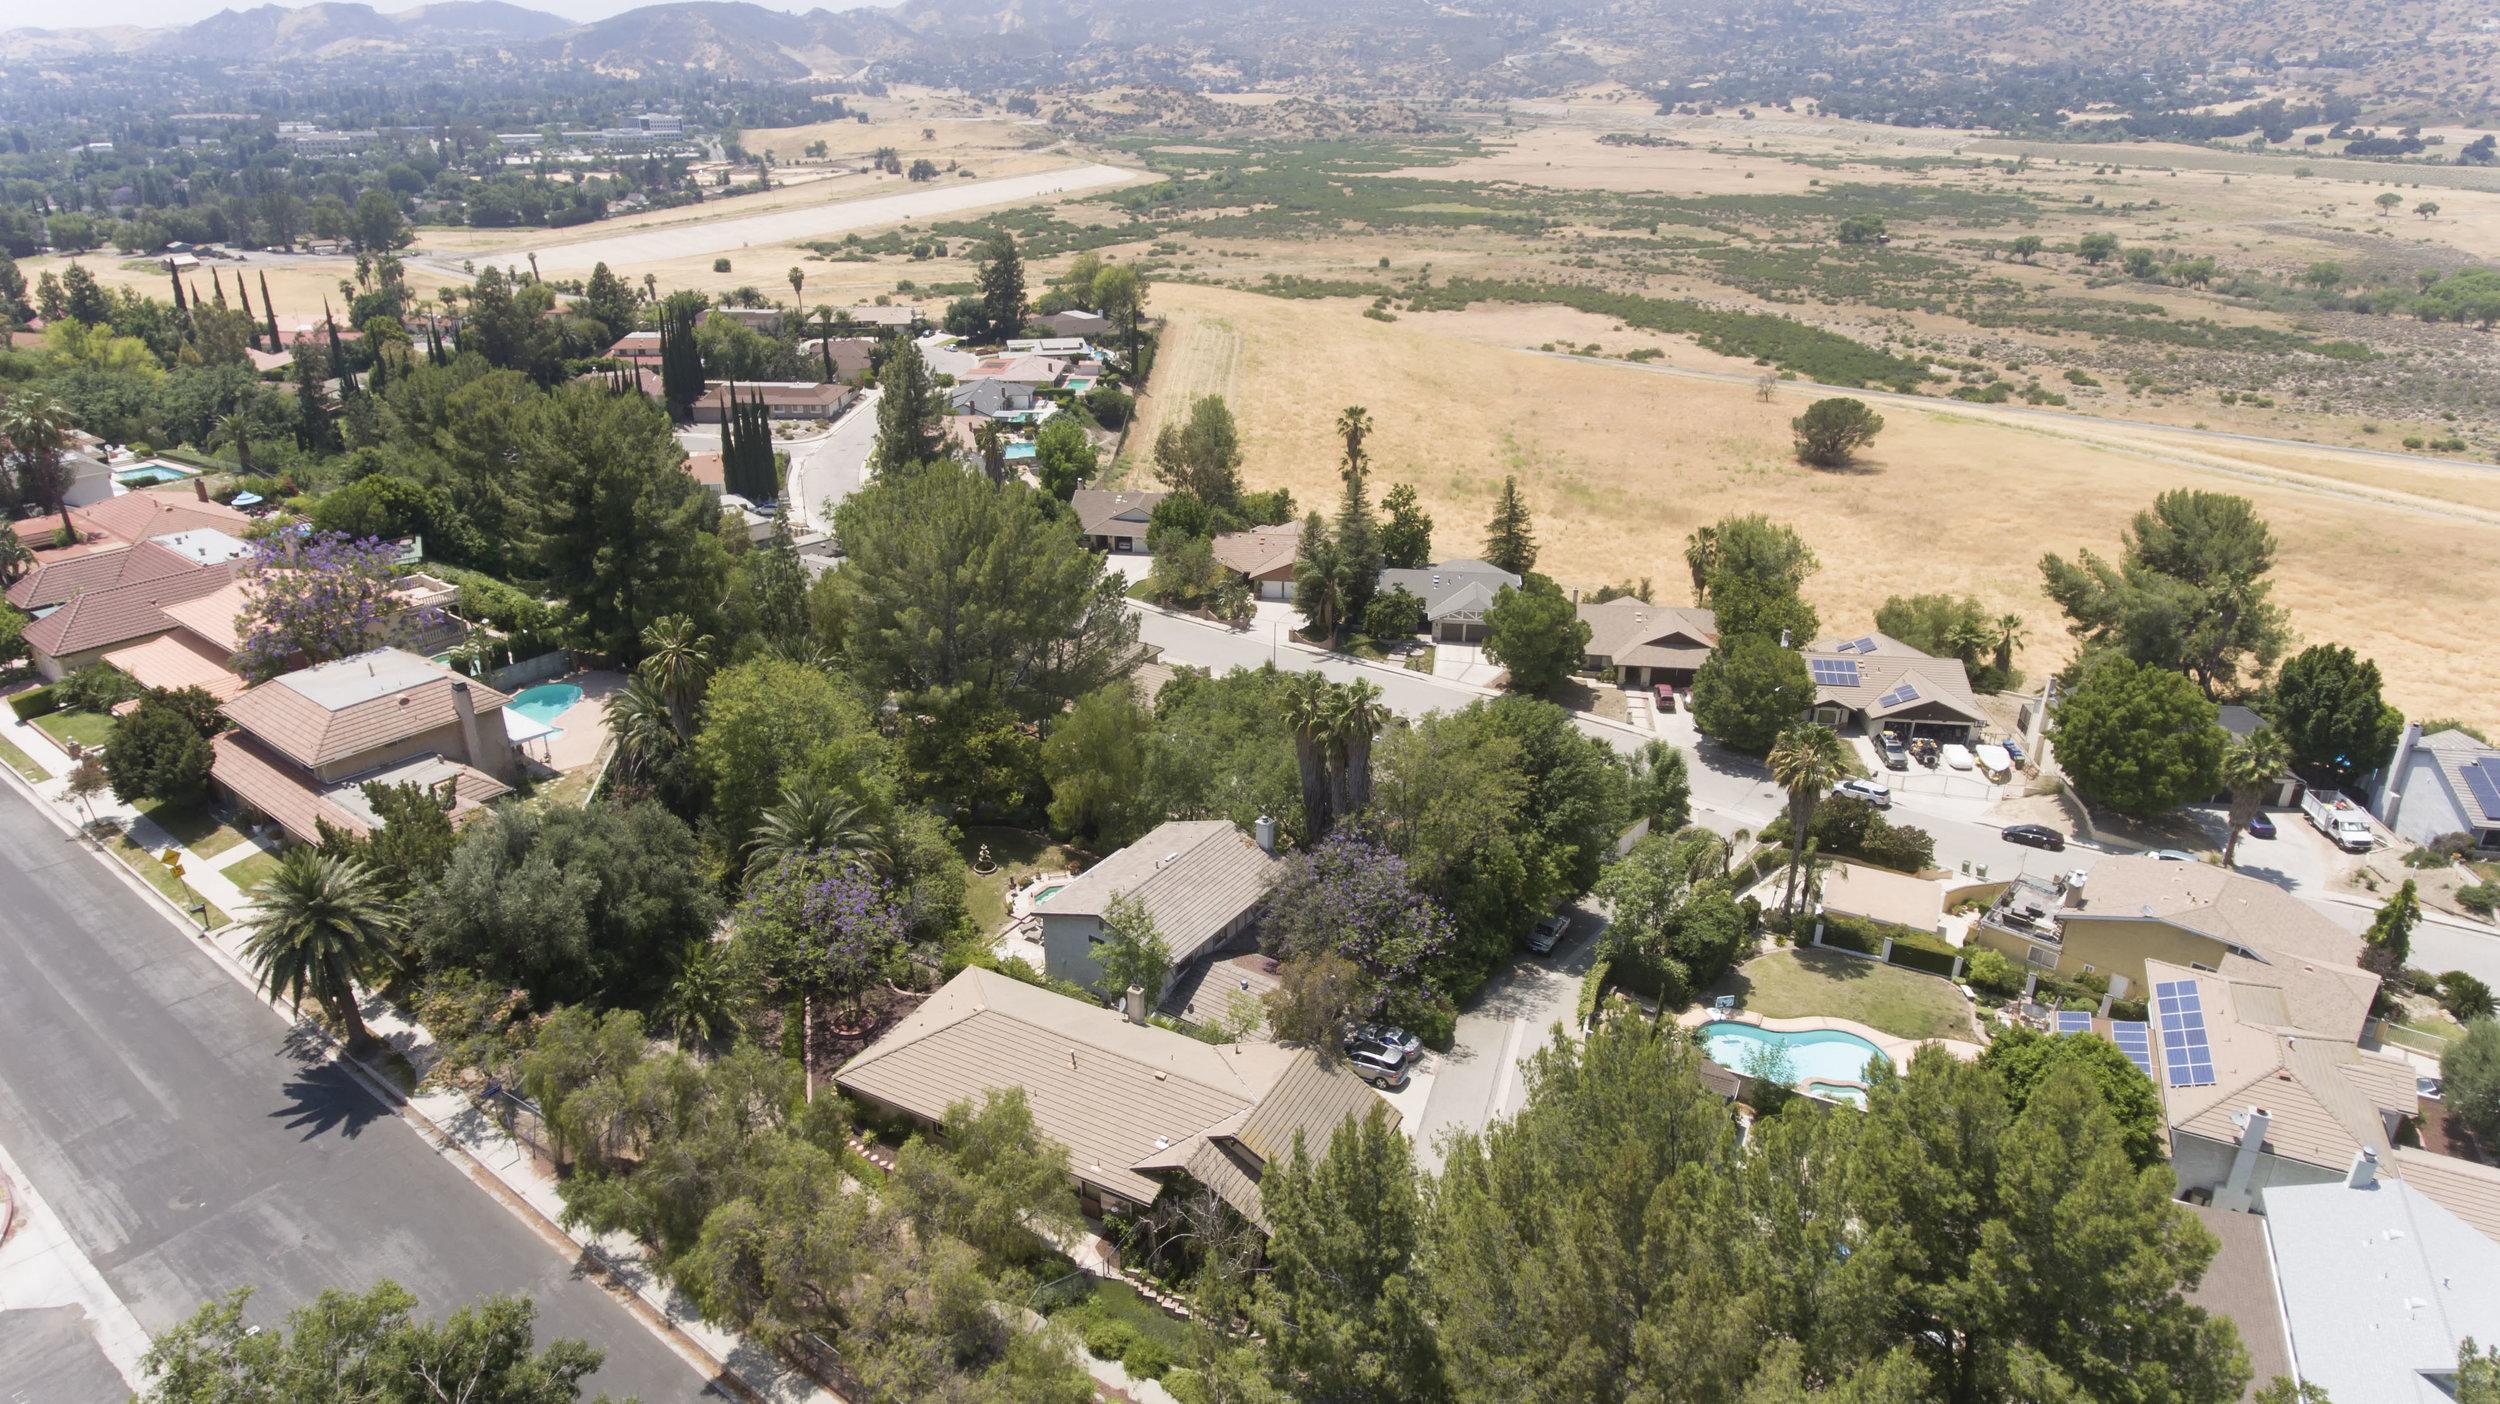 022 aerial 8832 Moorcroft Avenue West Hills For Sale Lease The Malibu Life Team Luxury Real Estate.jpg